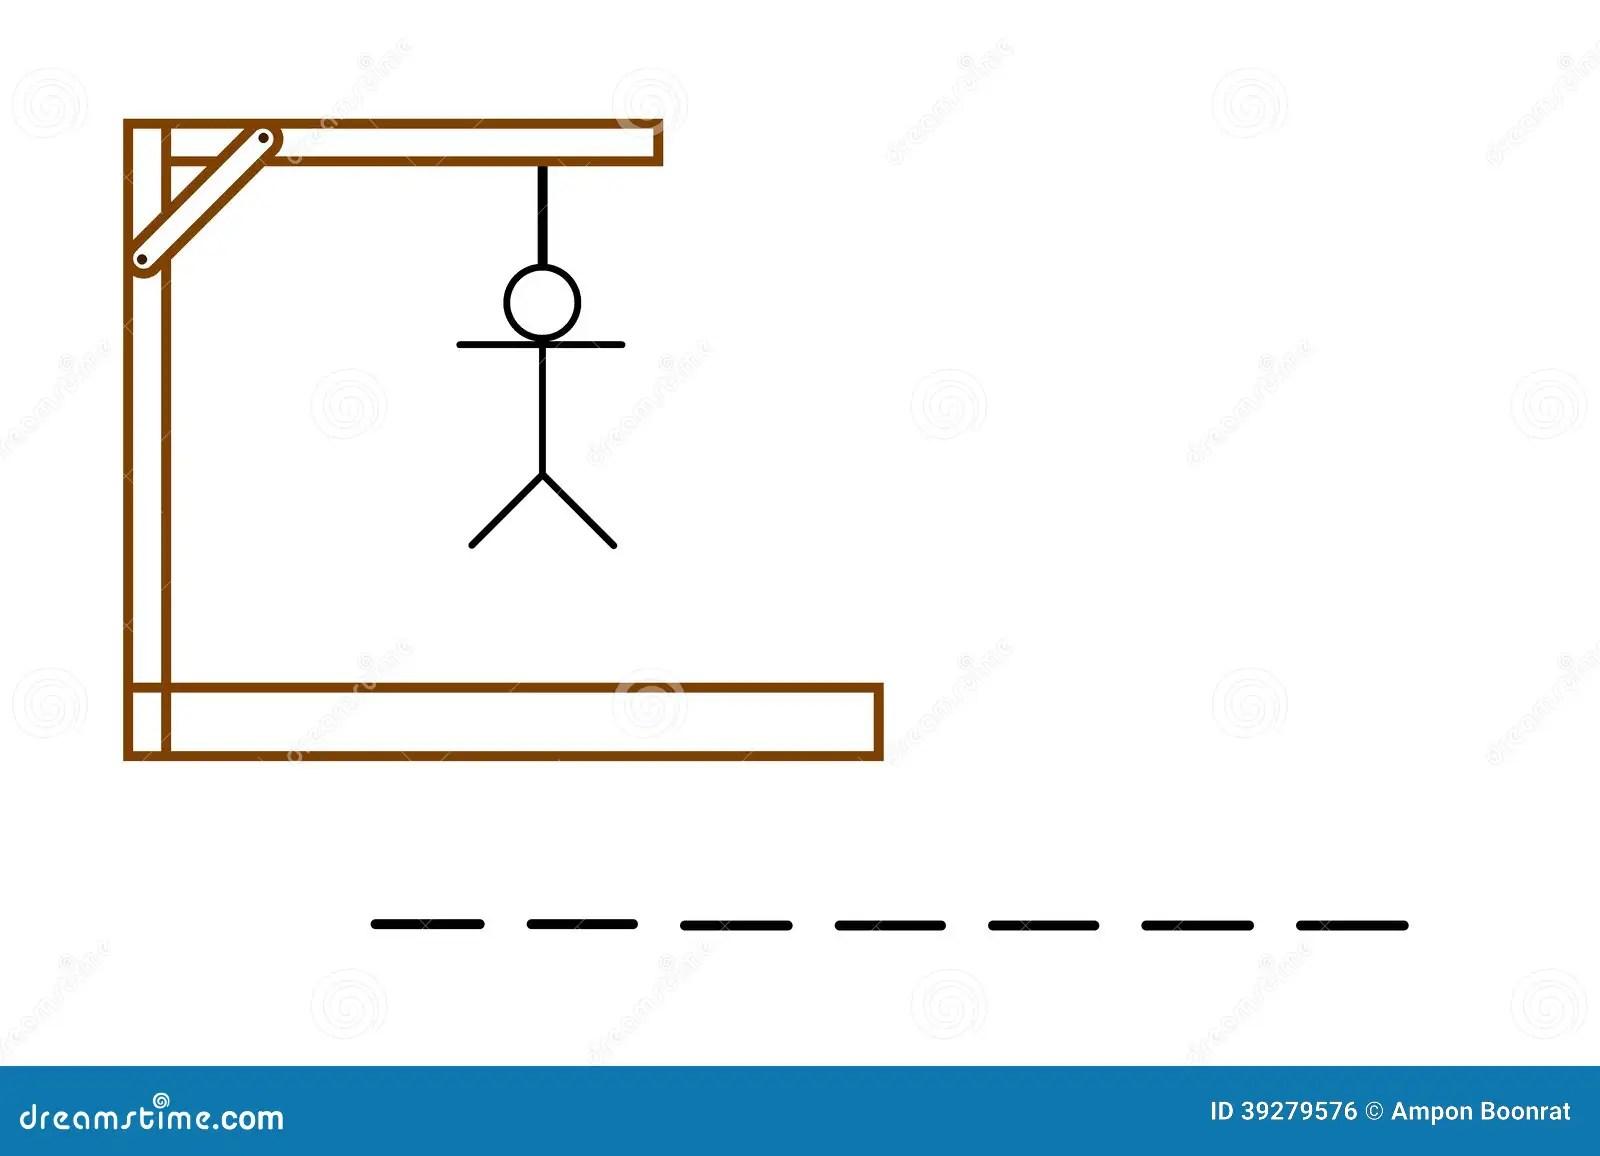 Hangman Game On White Background Stock Illustration